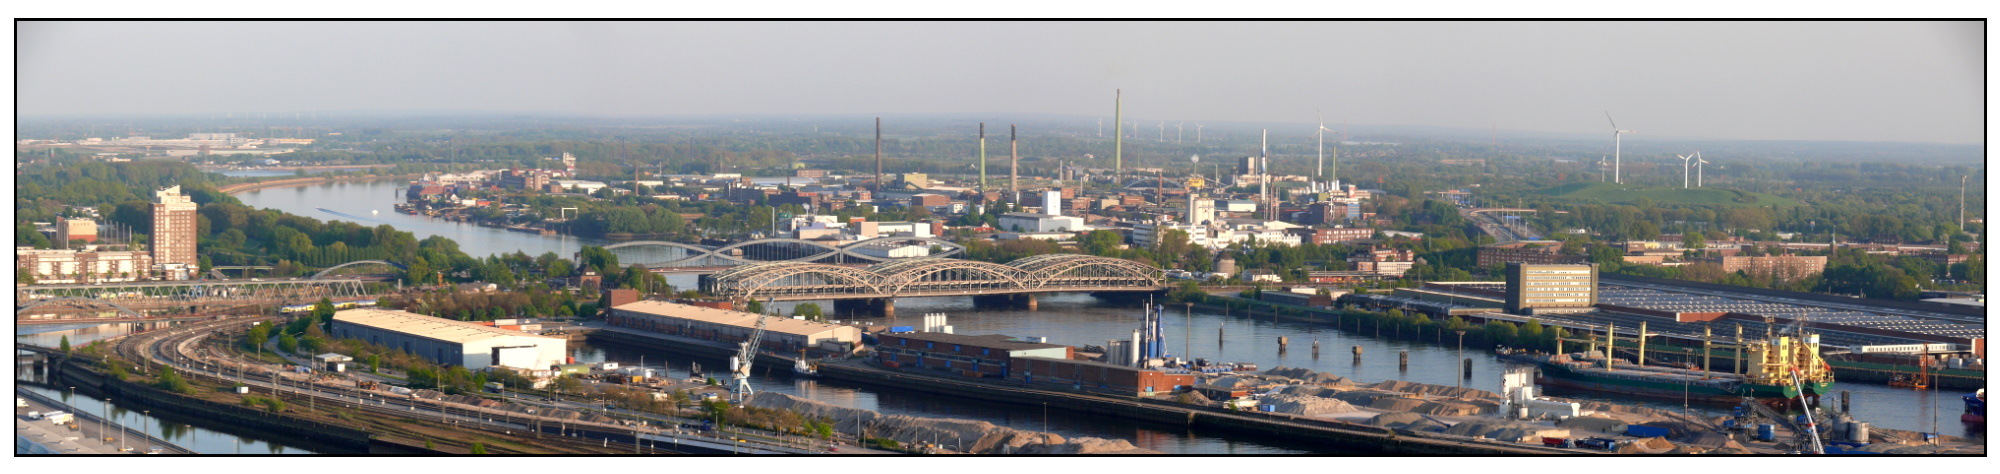 Highflyer Hamburg - Elbbrücken